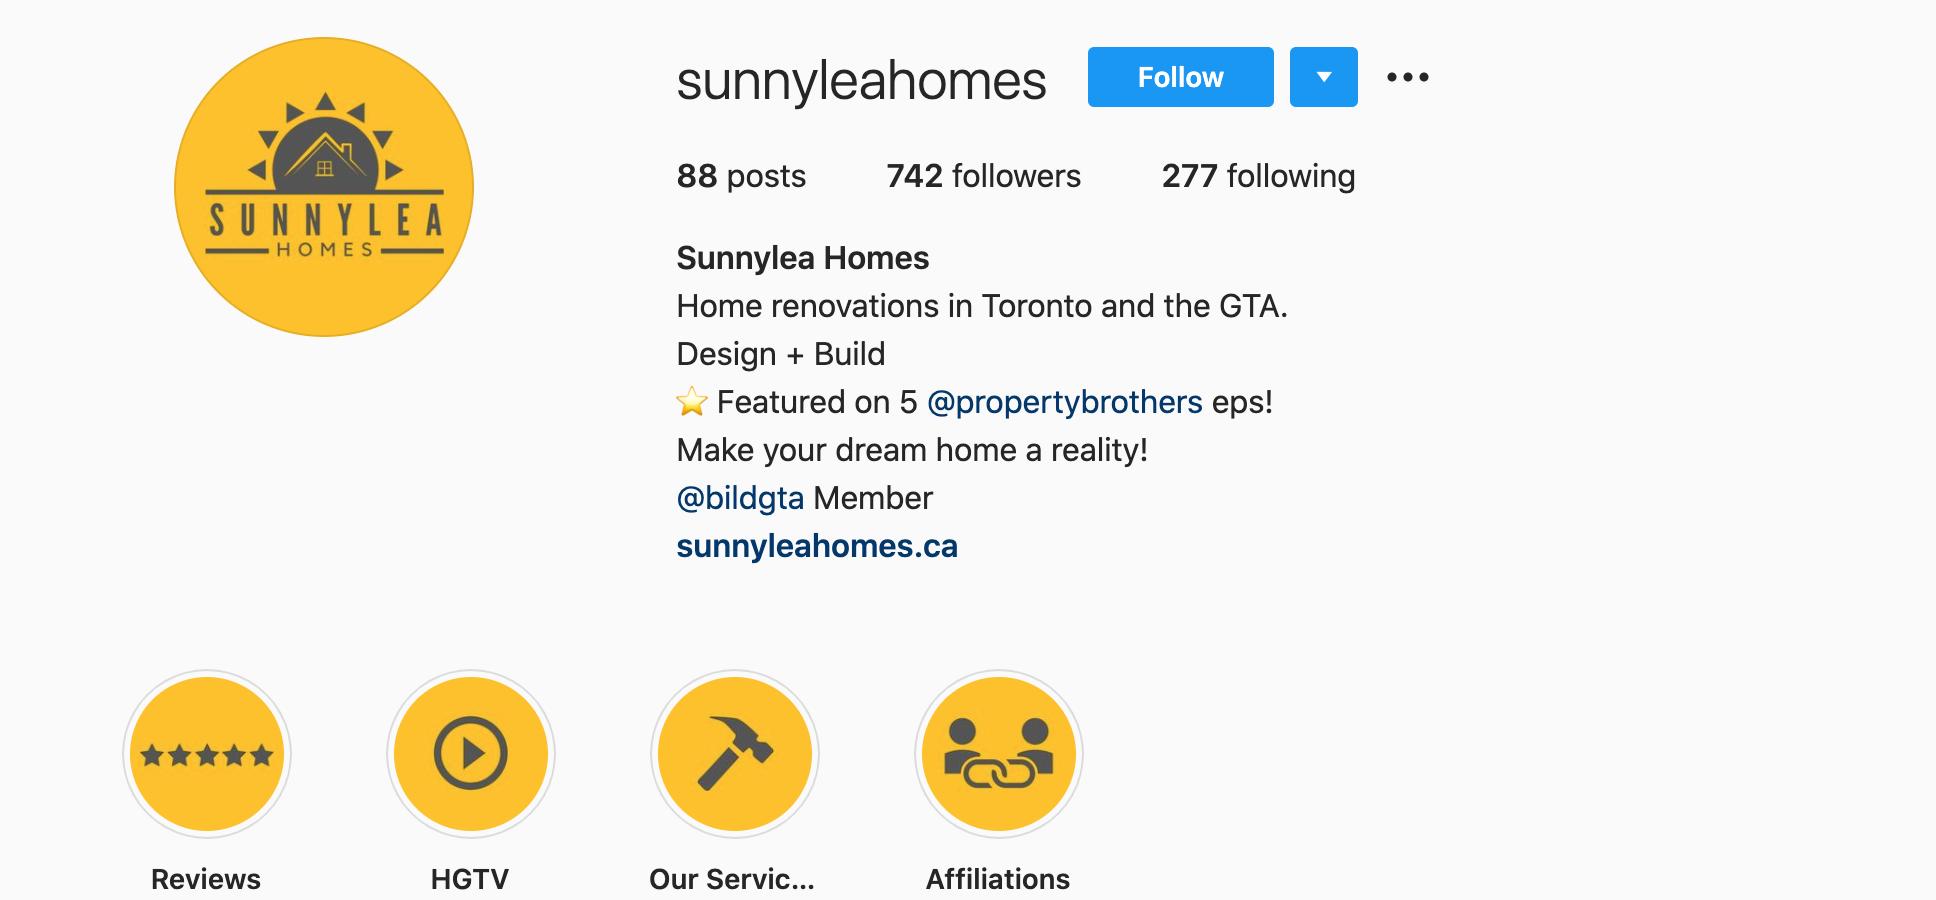 sunnylea-homes-sunnyleahomes-instagram-profile